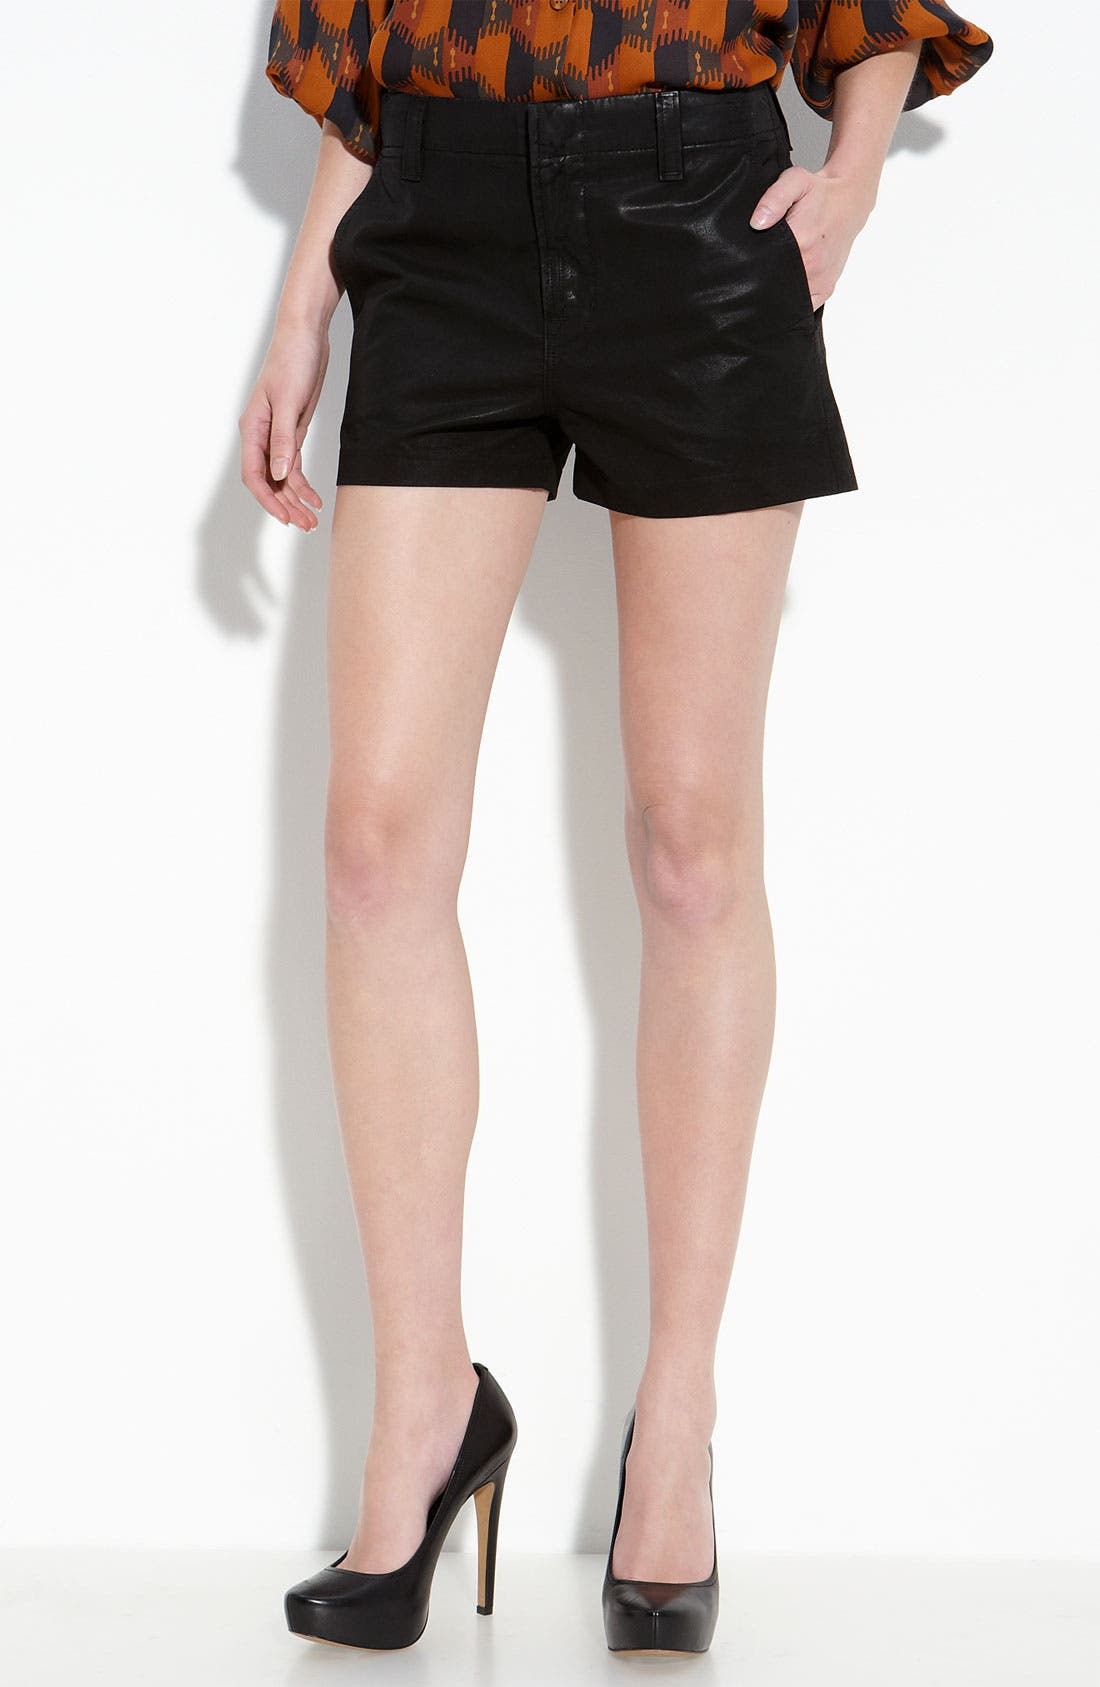 Main Image - J Brand 'Lola' High Rise Wax Coated Denim Shorts